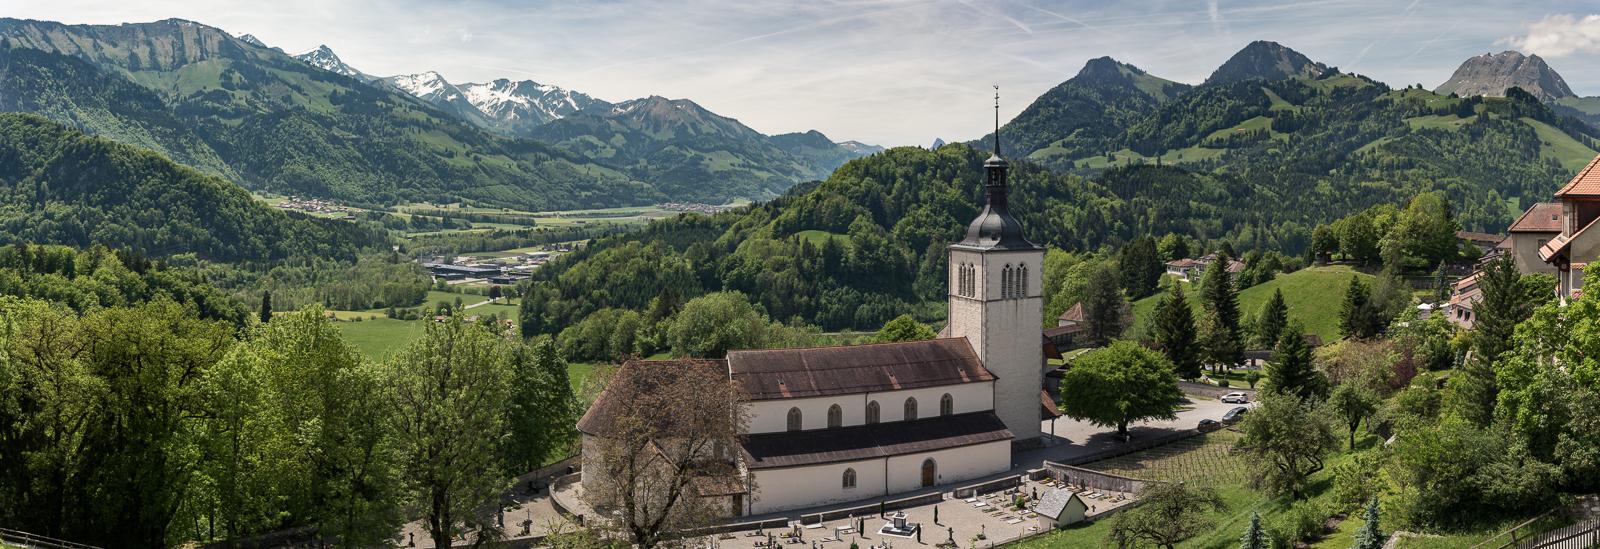 Kirche in Gruyeres